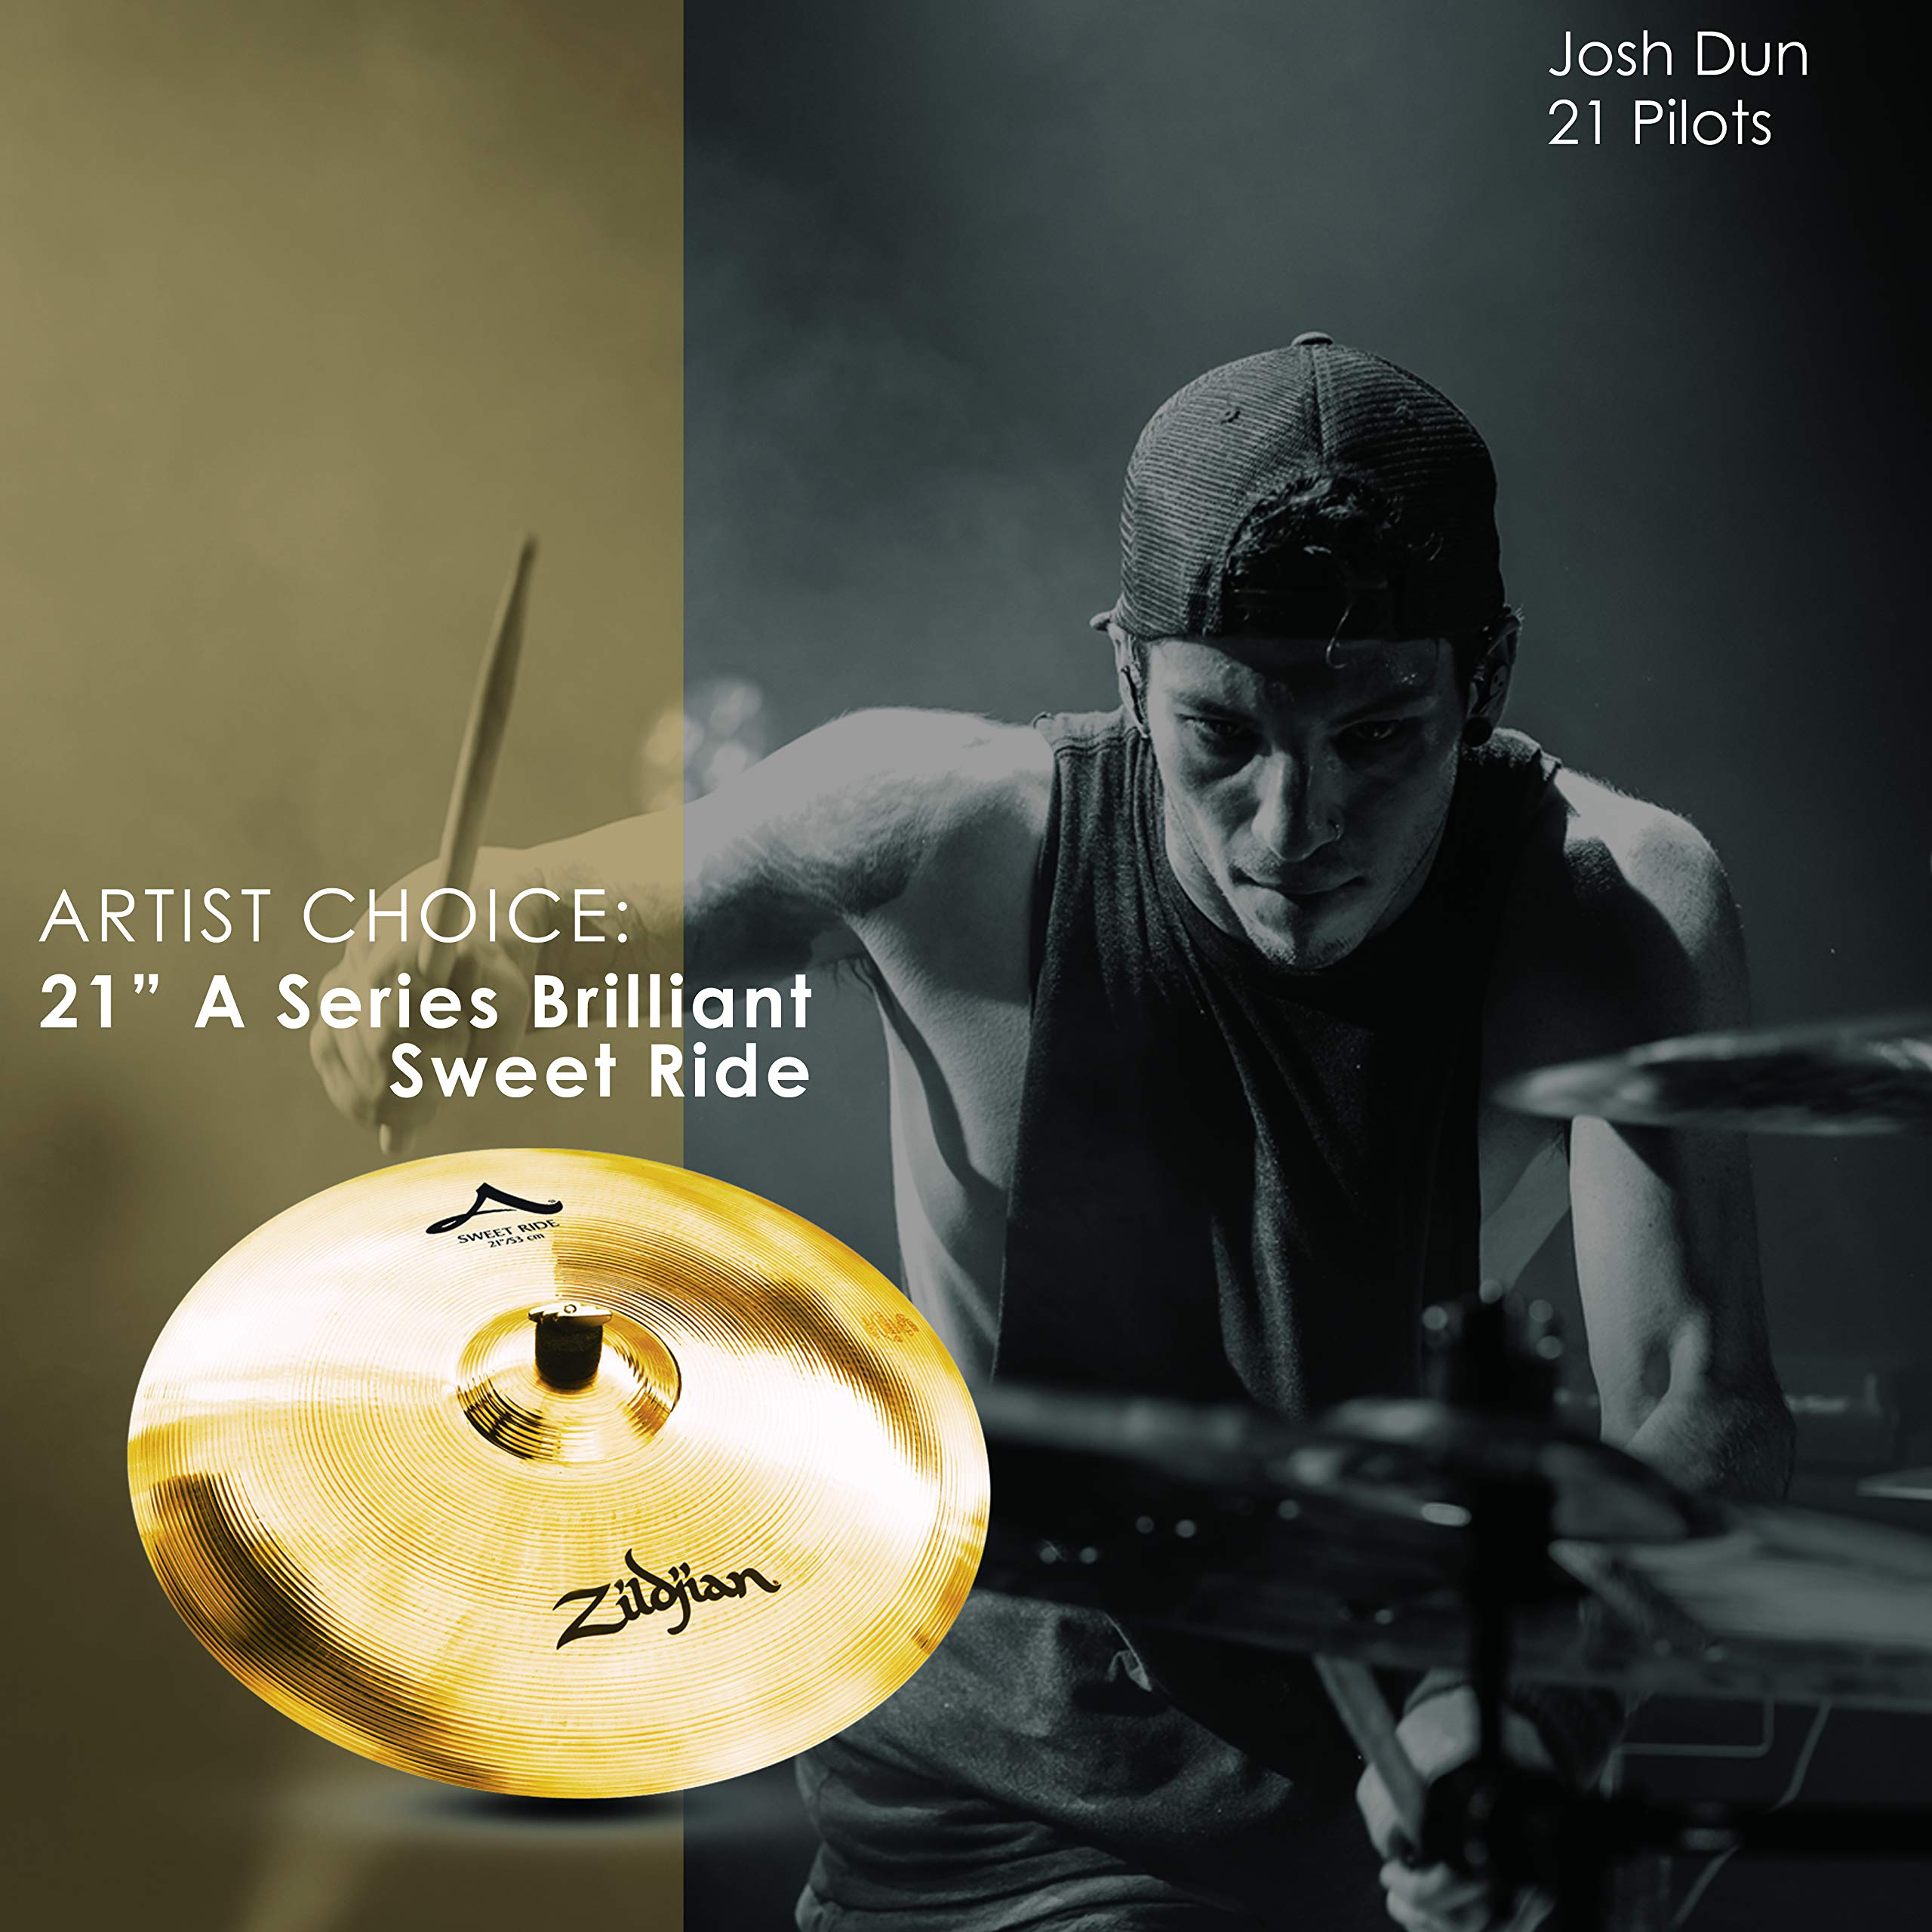 Zildjian A Series 21'' Sweet Ride Cymbal, Brilliant